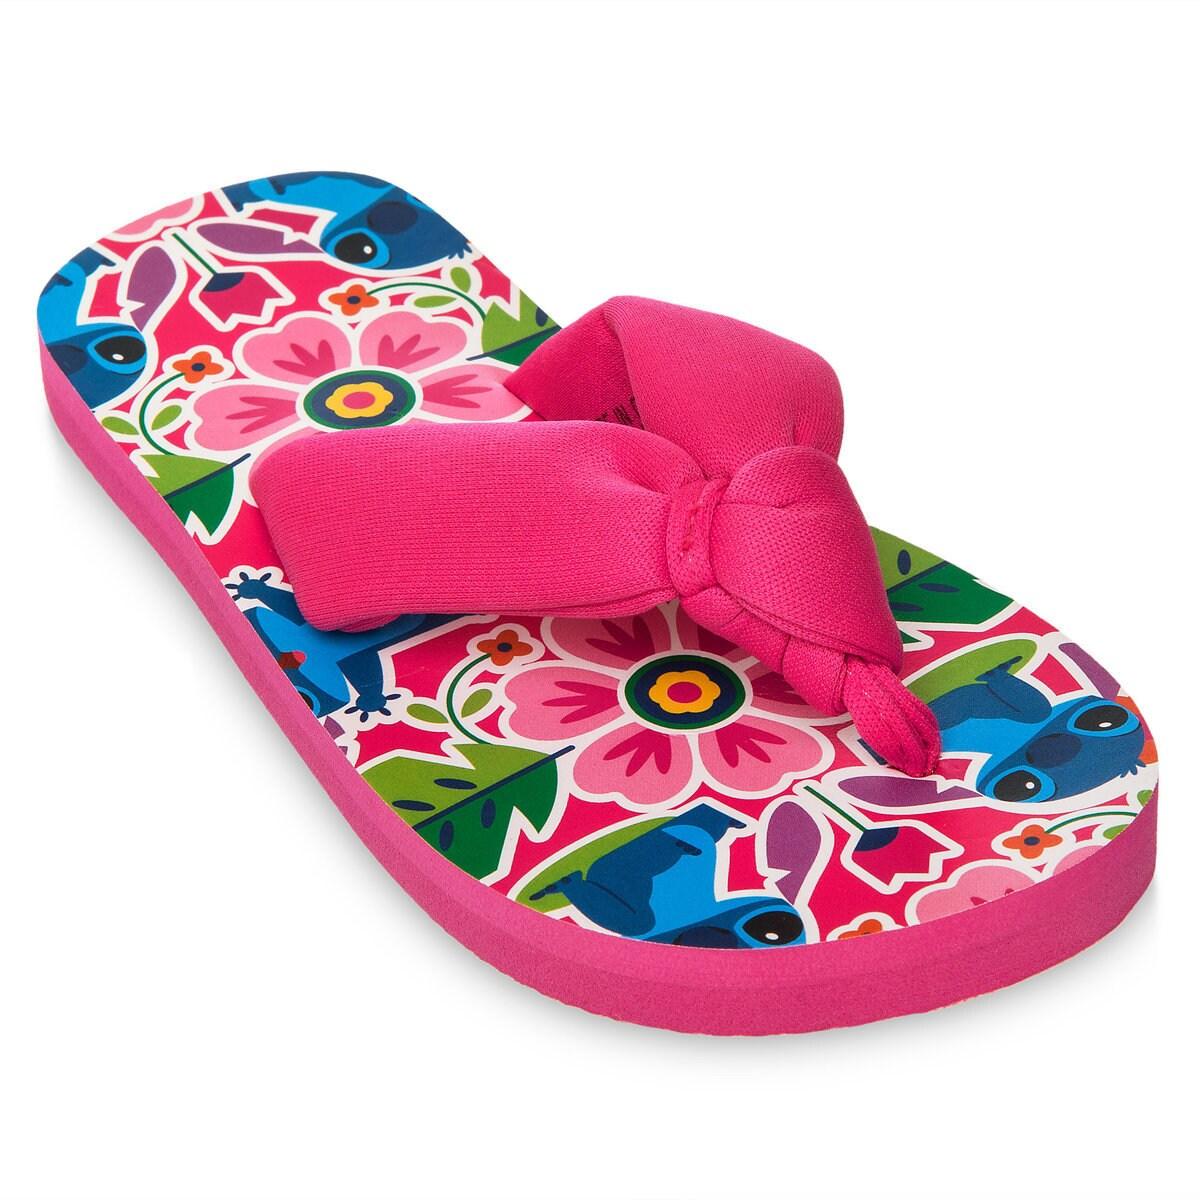 29c756df08dfa Product Image of Stitch Flip Flops for Girls # 1